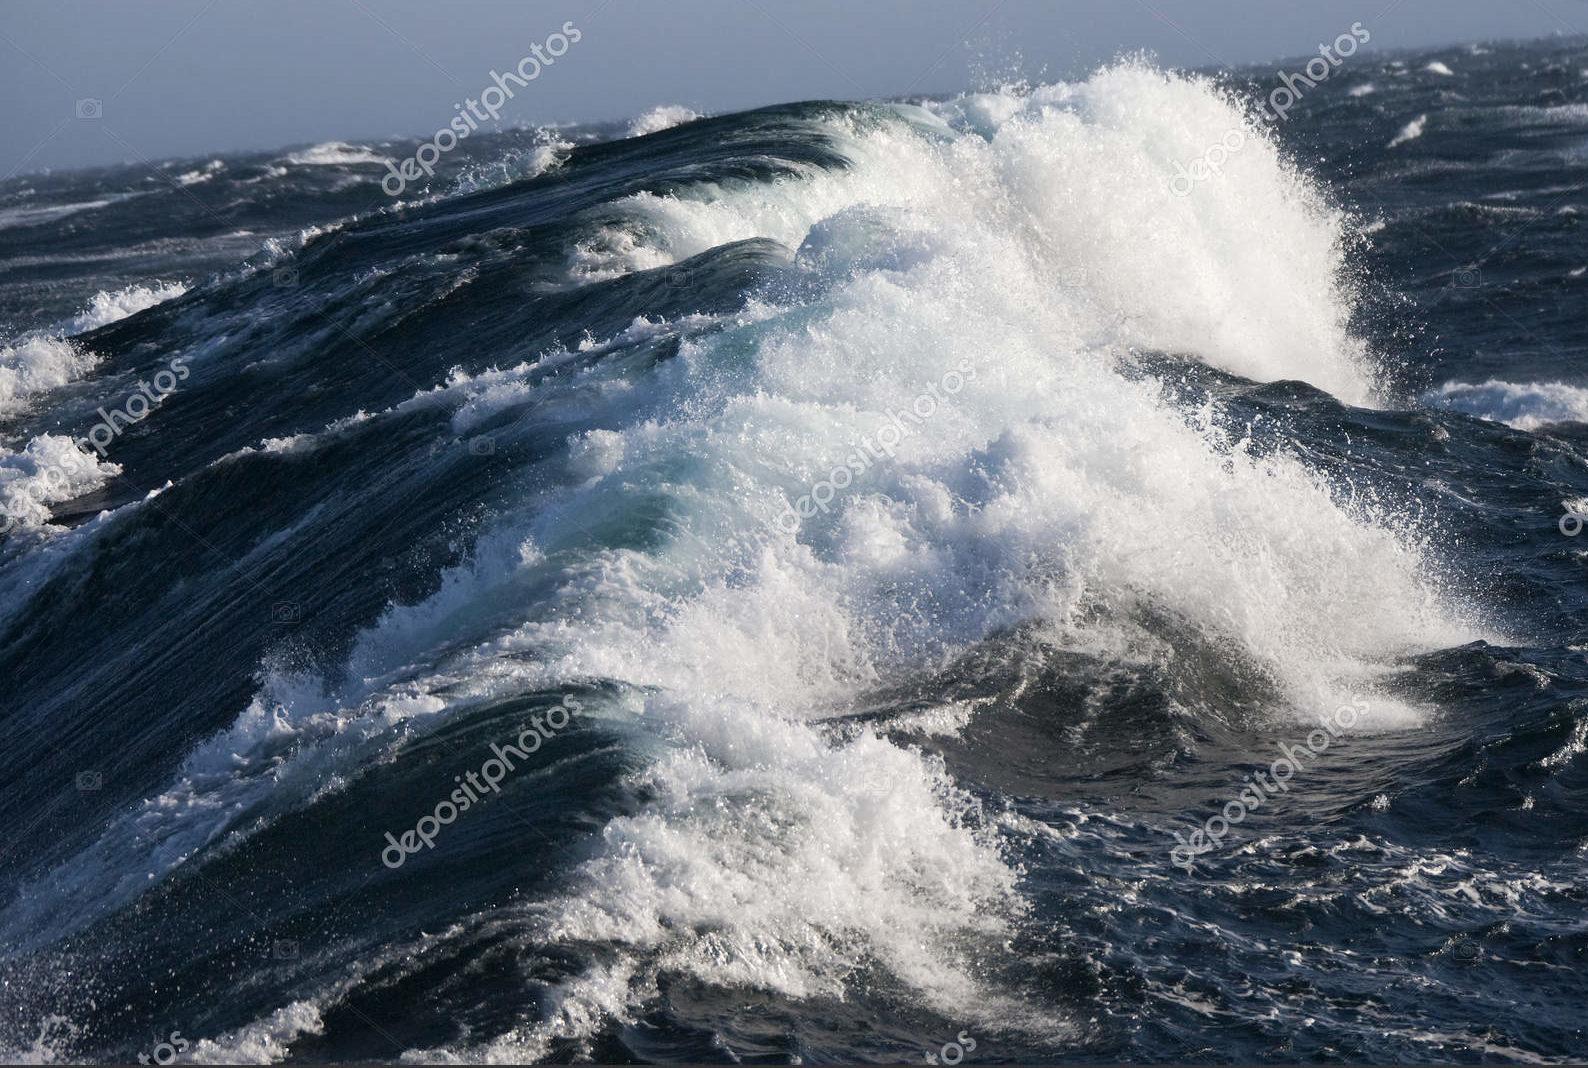 Волны Северного ледовитого